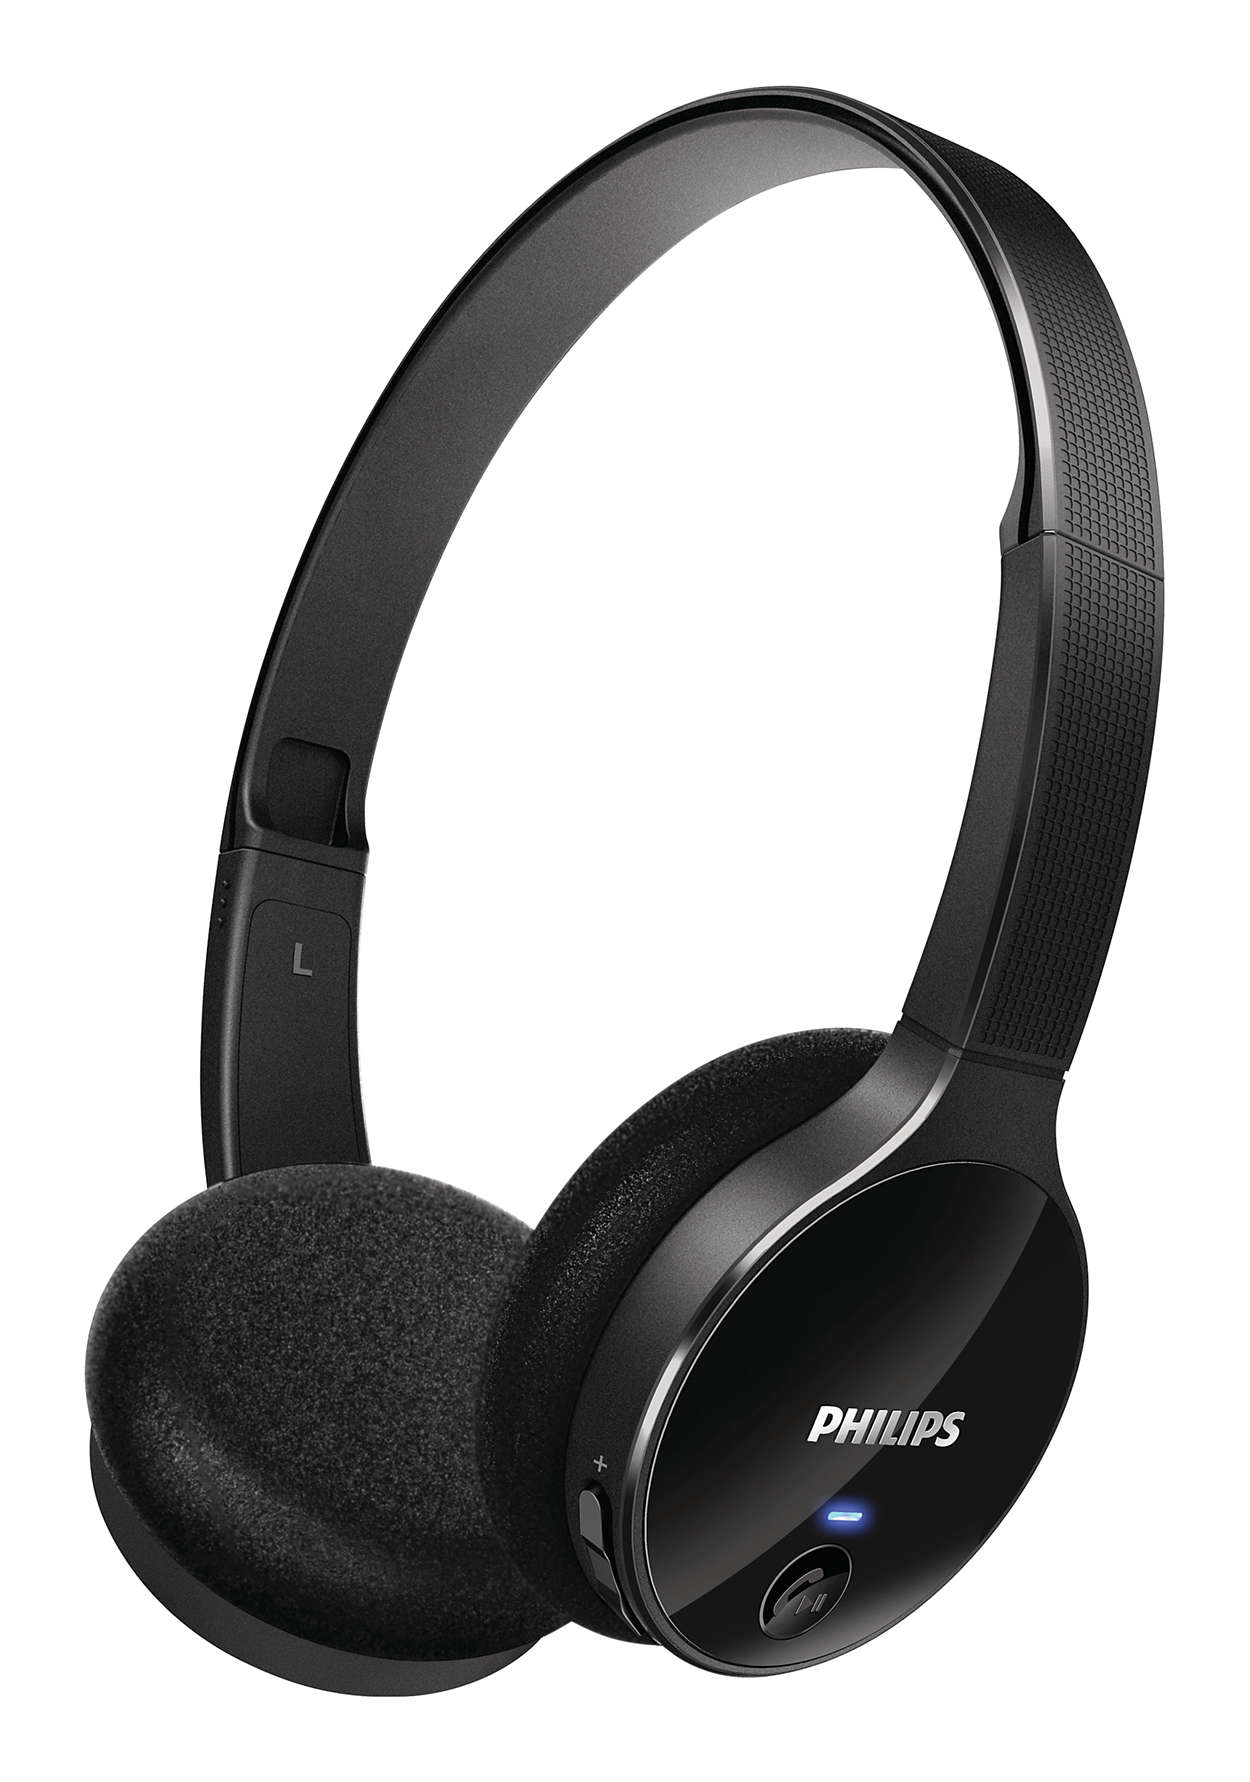 8db875f4c0d Bluetooth stereo headset SHB4000/00 | Philips